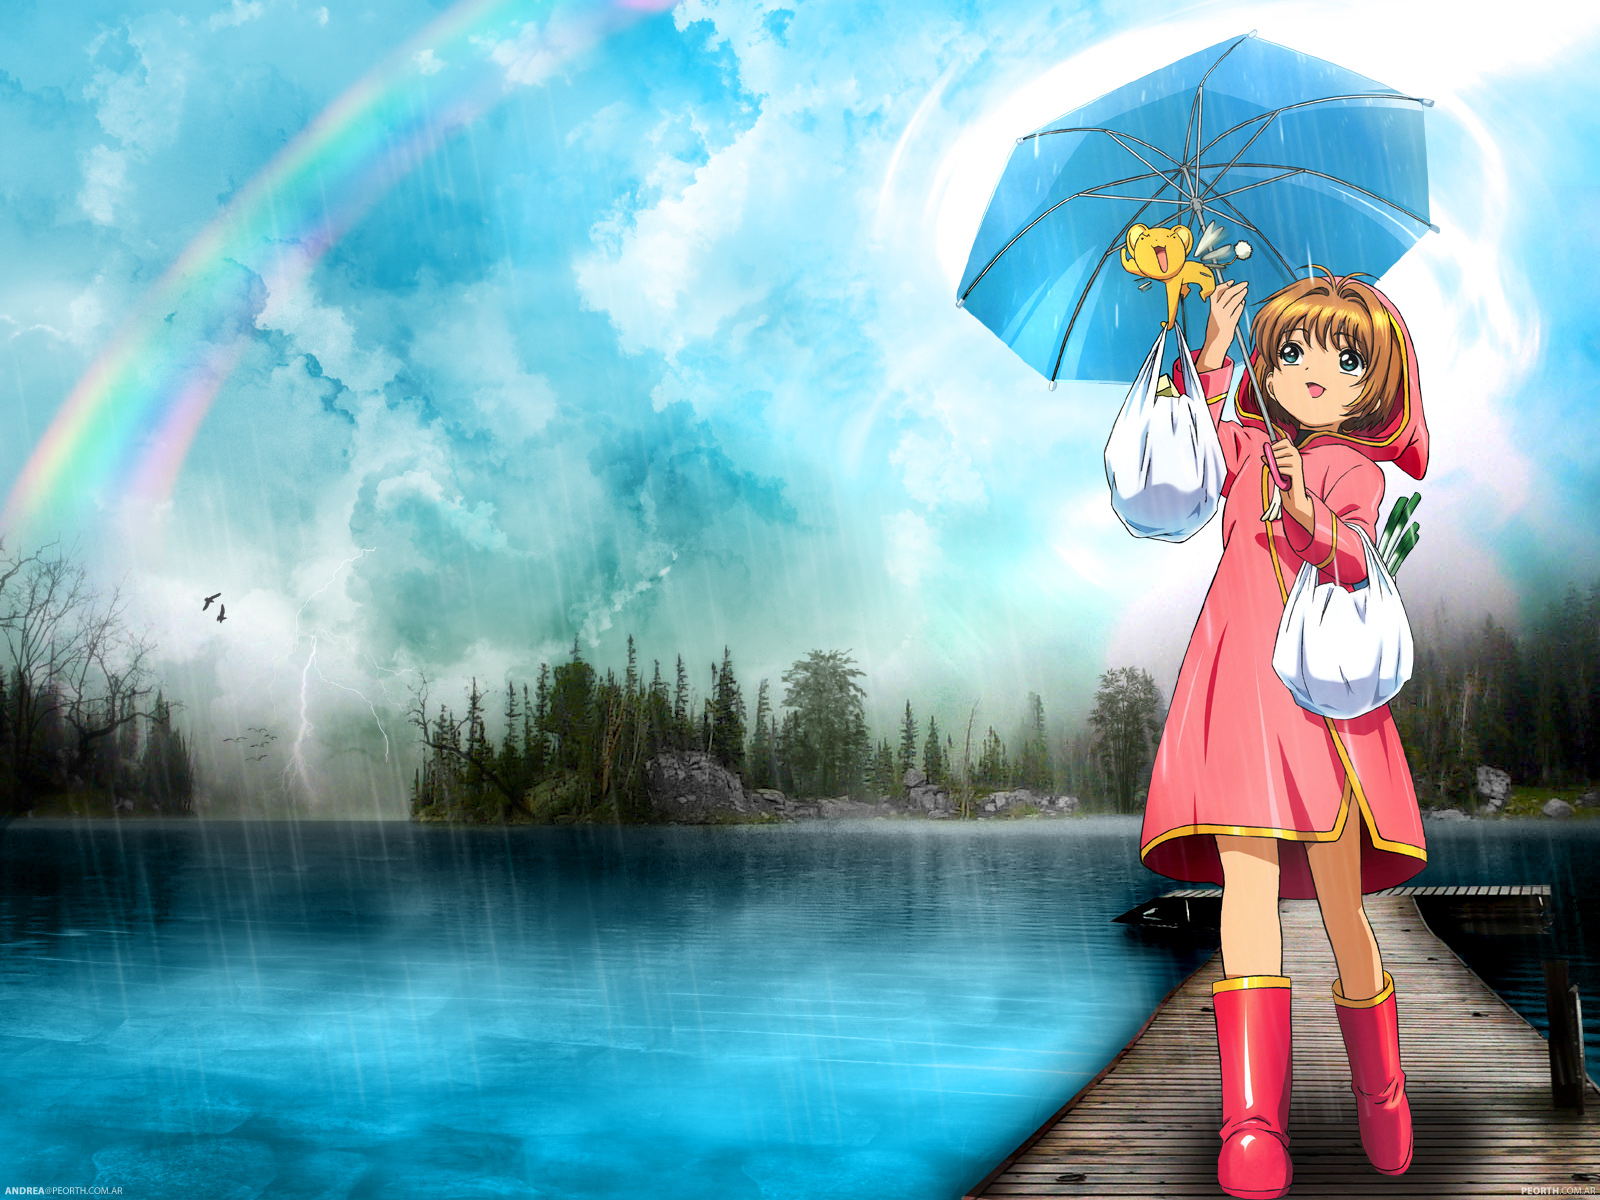 card_captor_sakura kero kinomoto_sakura rain umbrella water